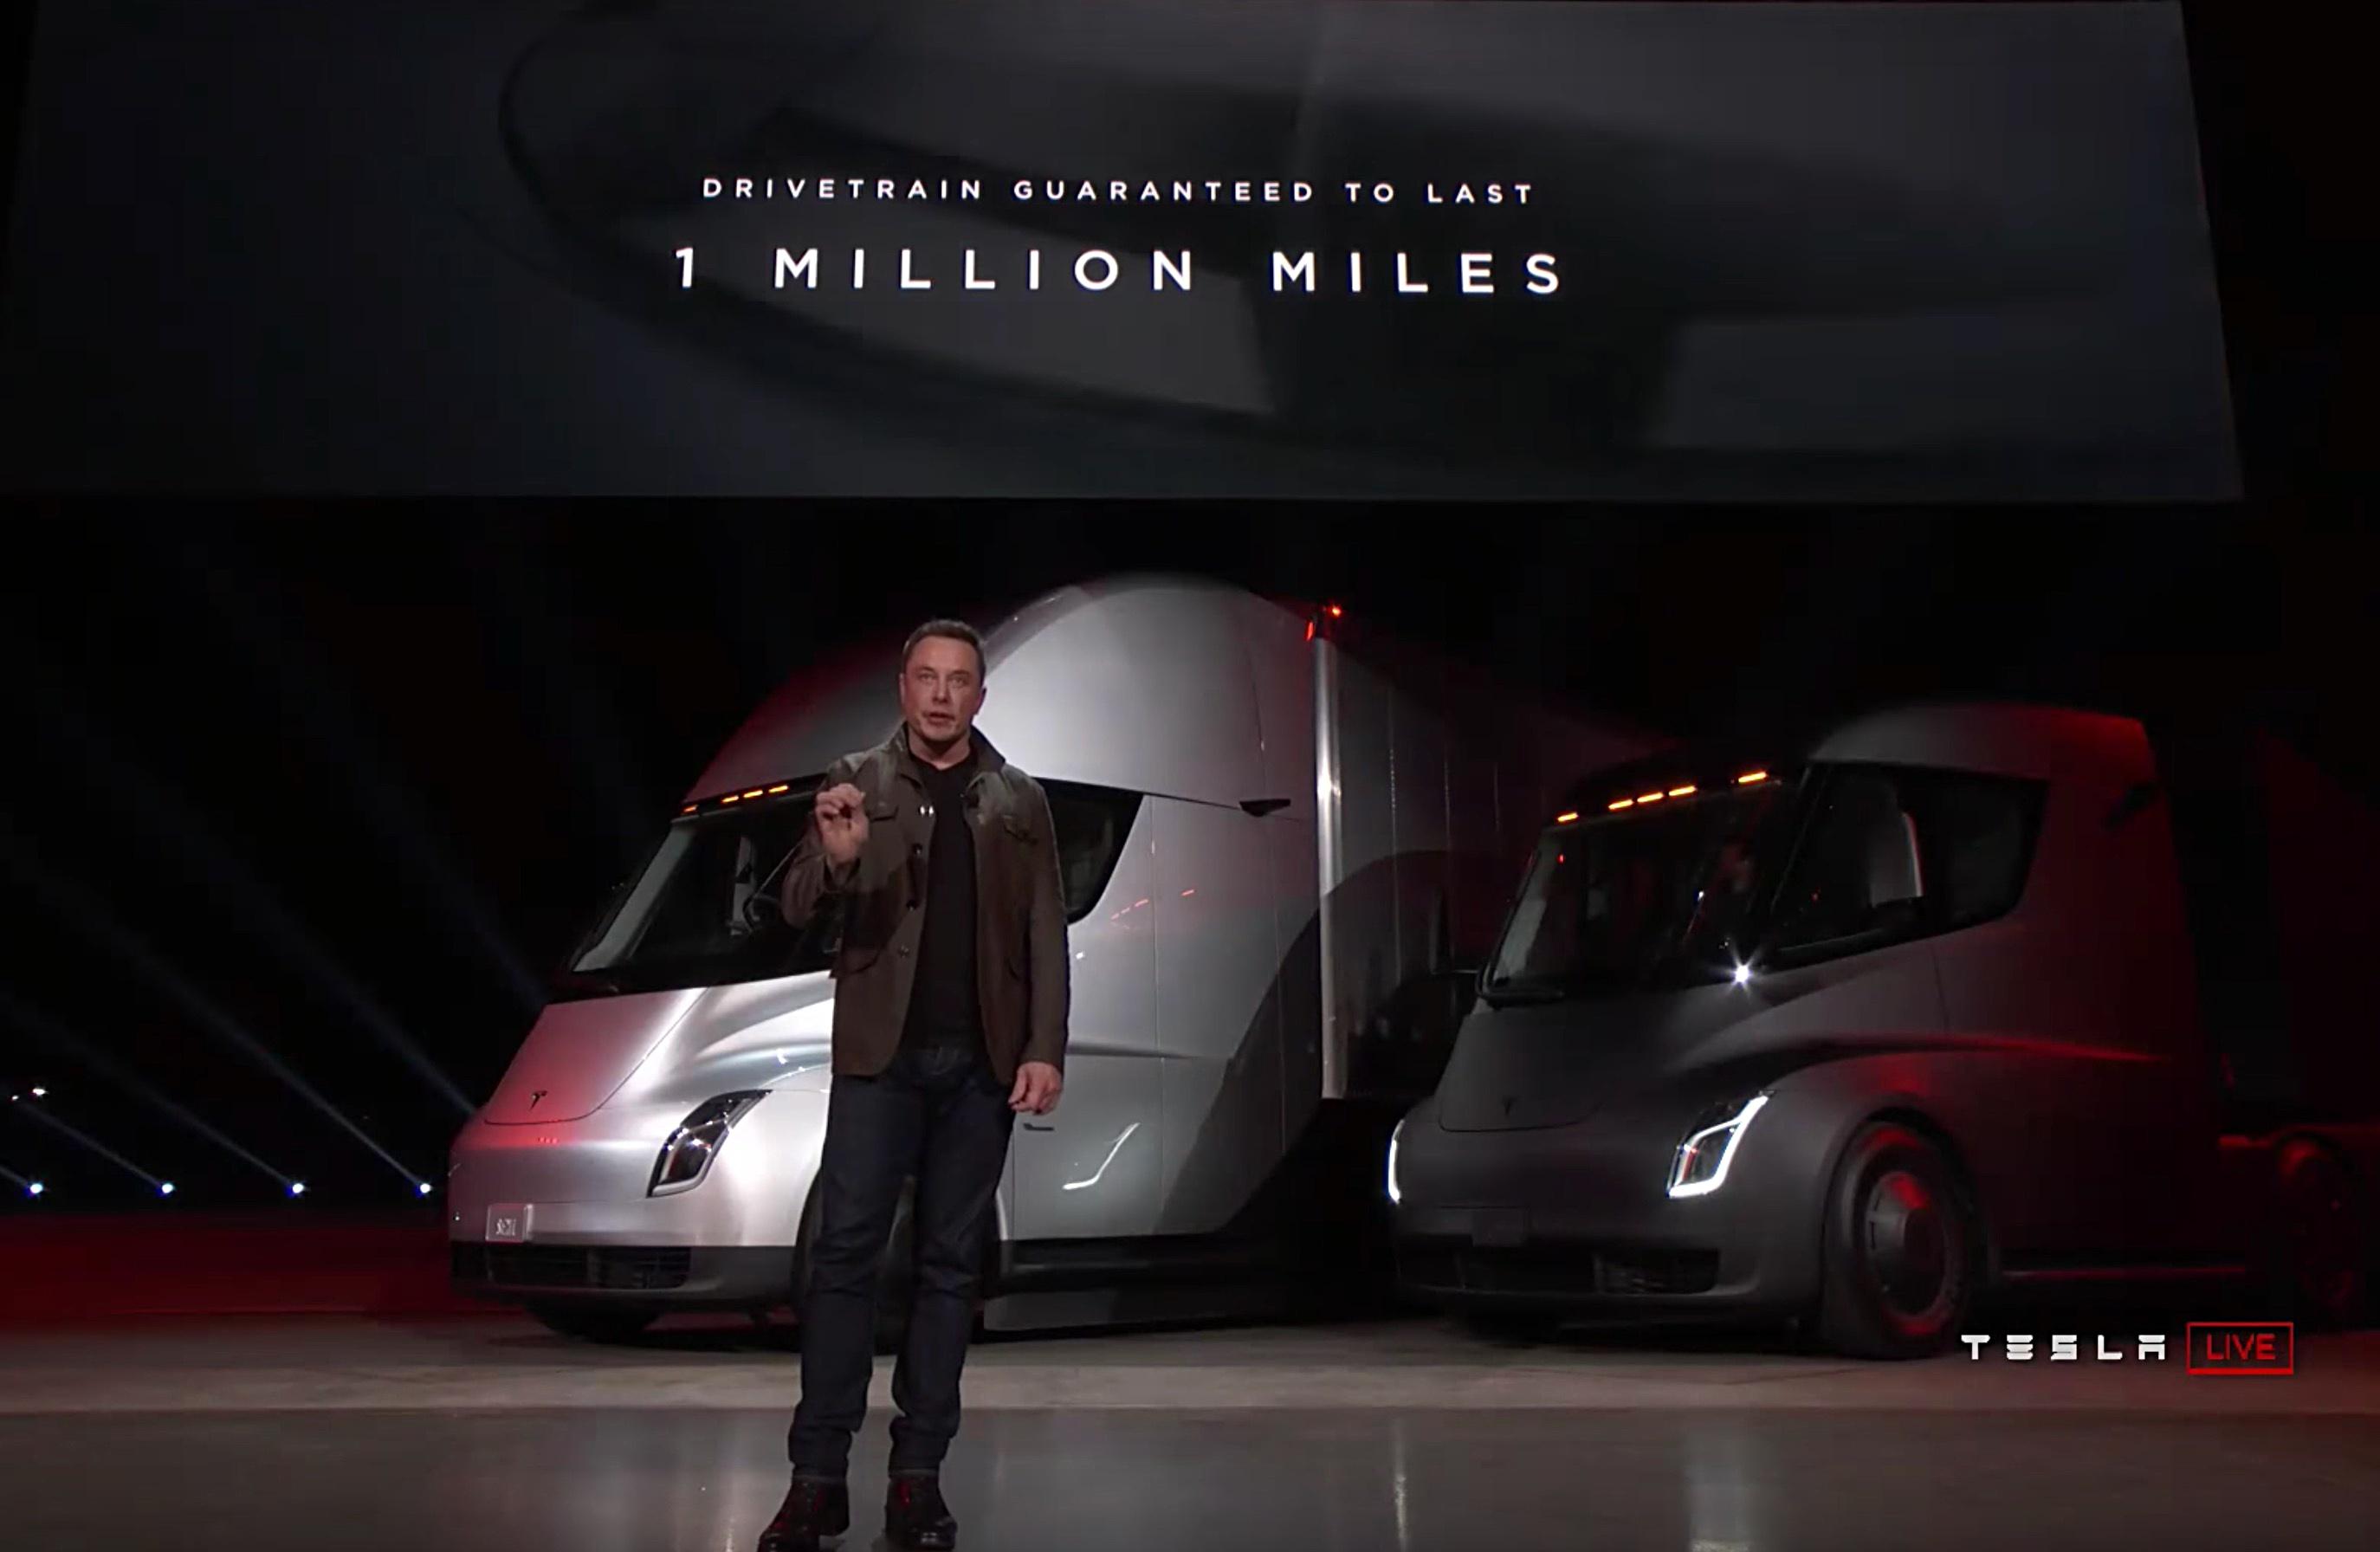 tesla-semi-drivetrain-1-million-miles